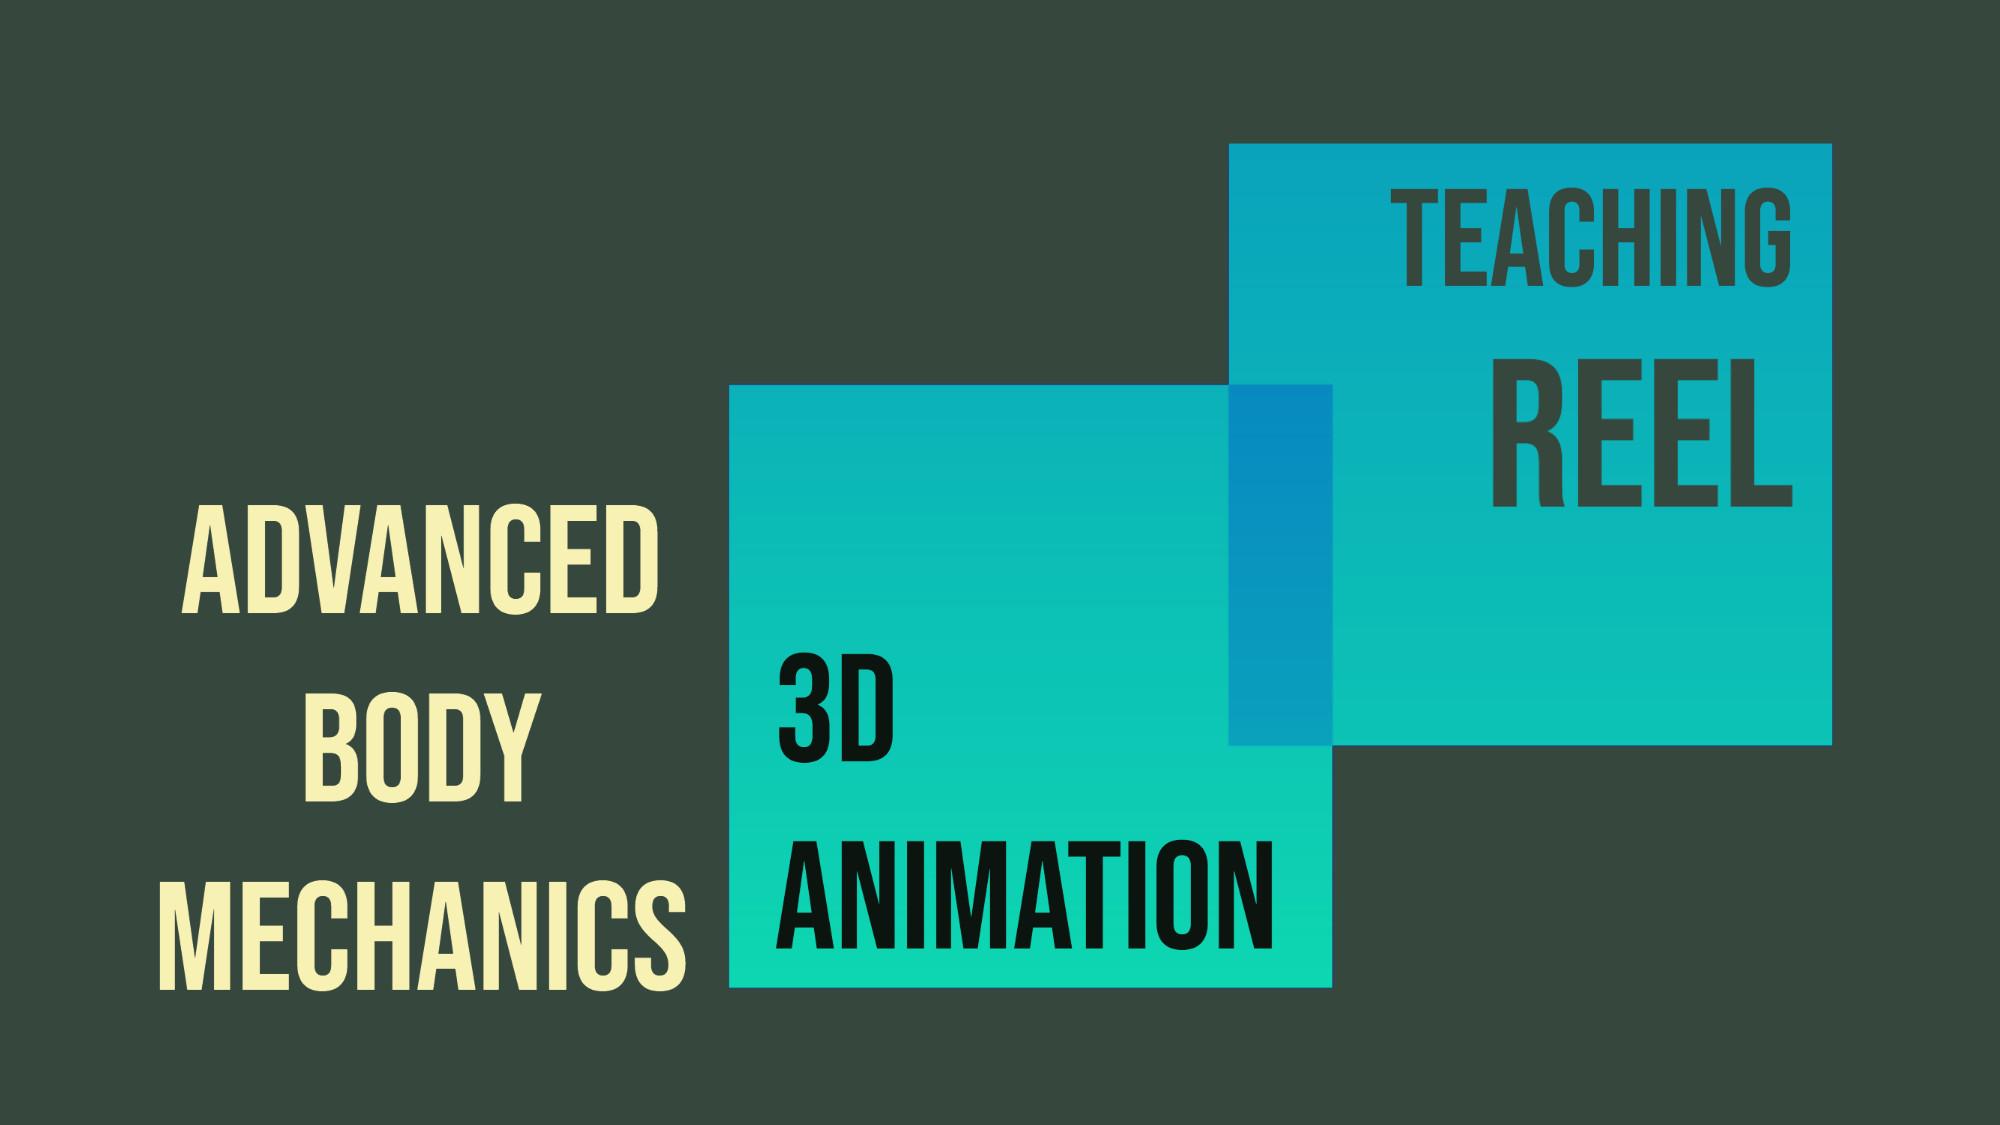 Advanced Body Mechanics. 3D Animation Teaching Reel, with Froggy Hearth Studio from Moldova/UK